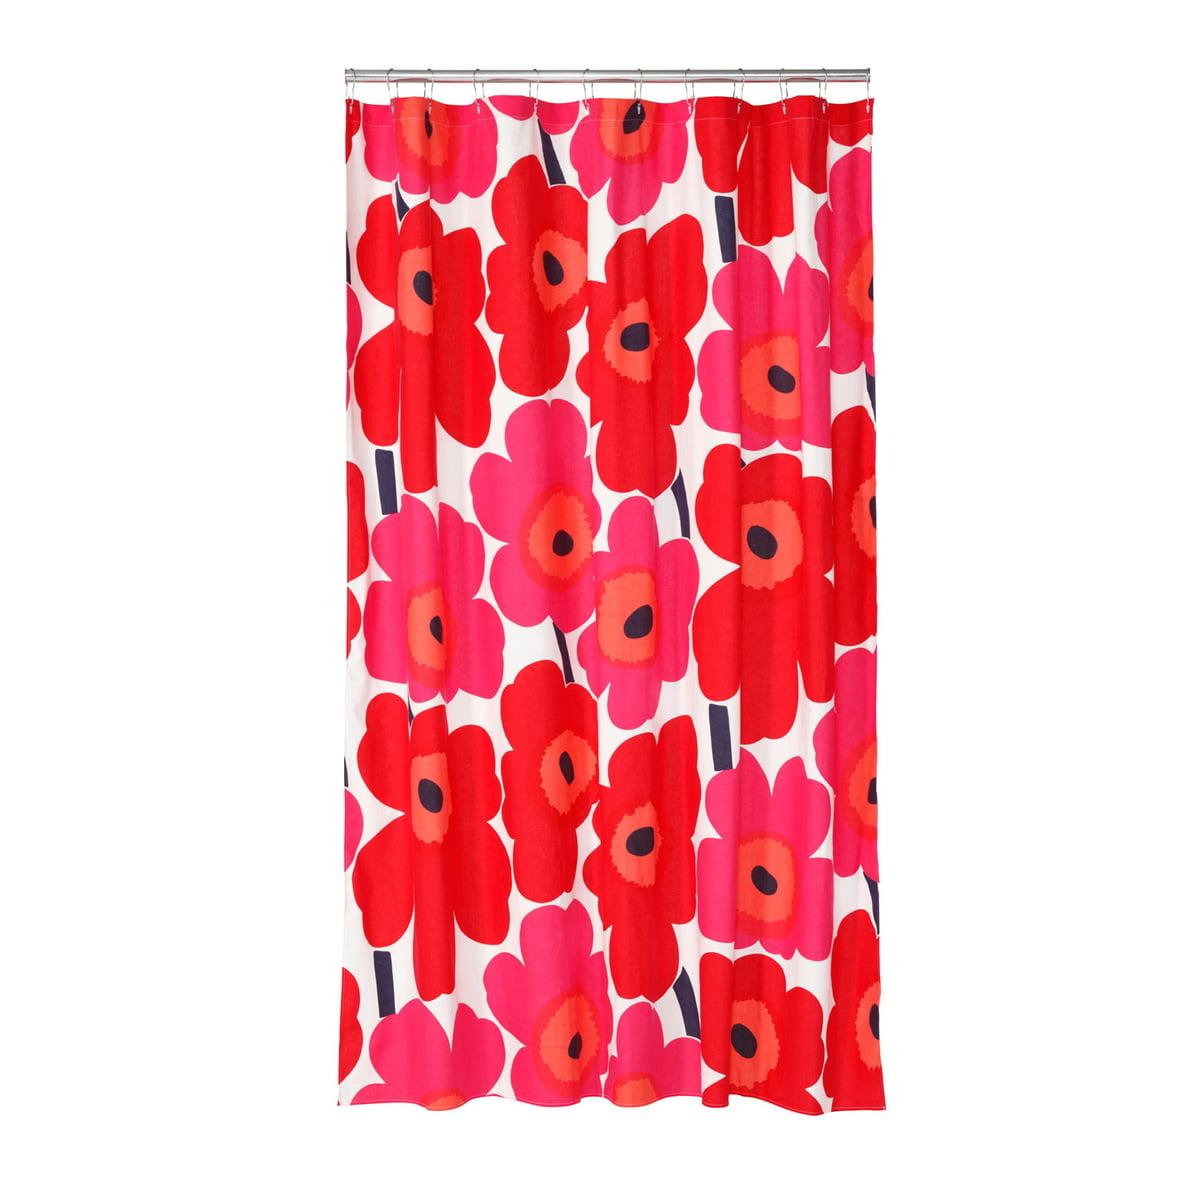 Marvelous Marimekko   Unikko Shower Curtain, White / Red